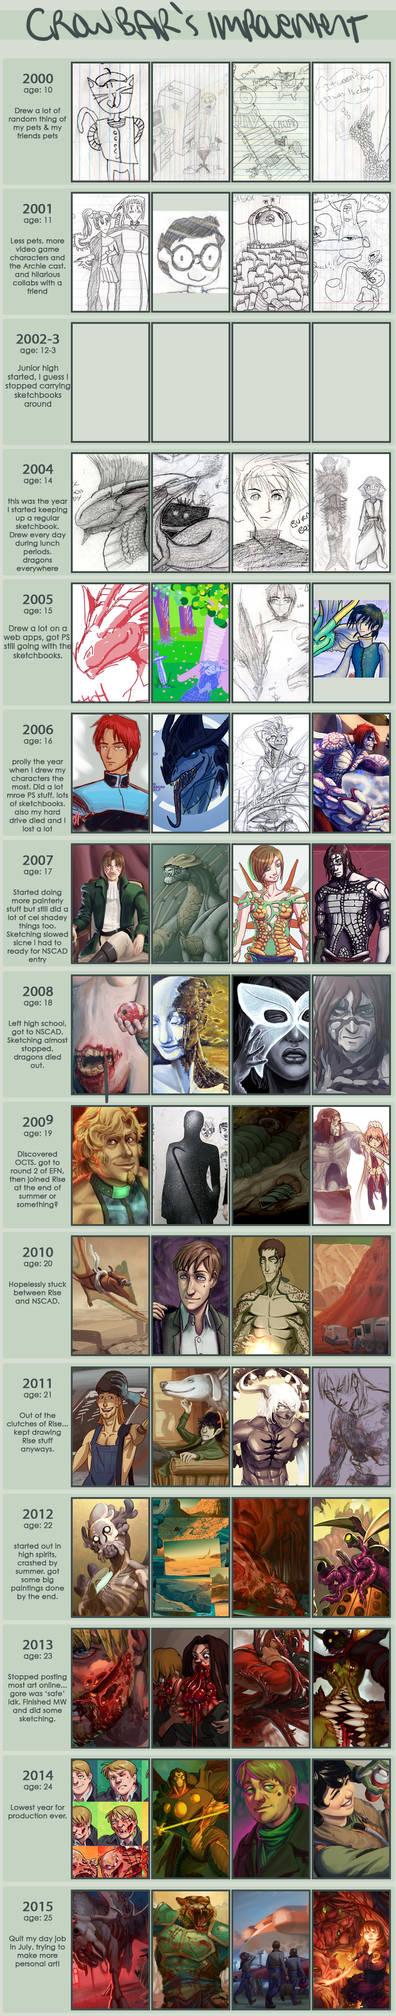 Improvement Meme 2000-2015 by MisterCrowbar